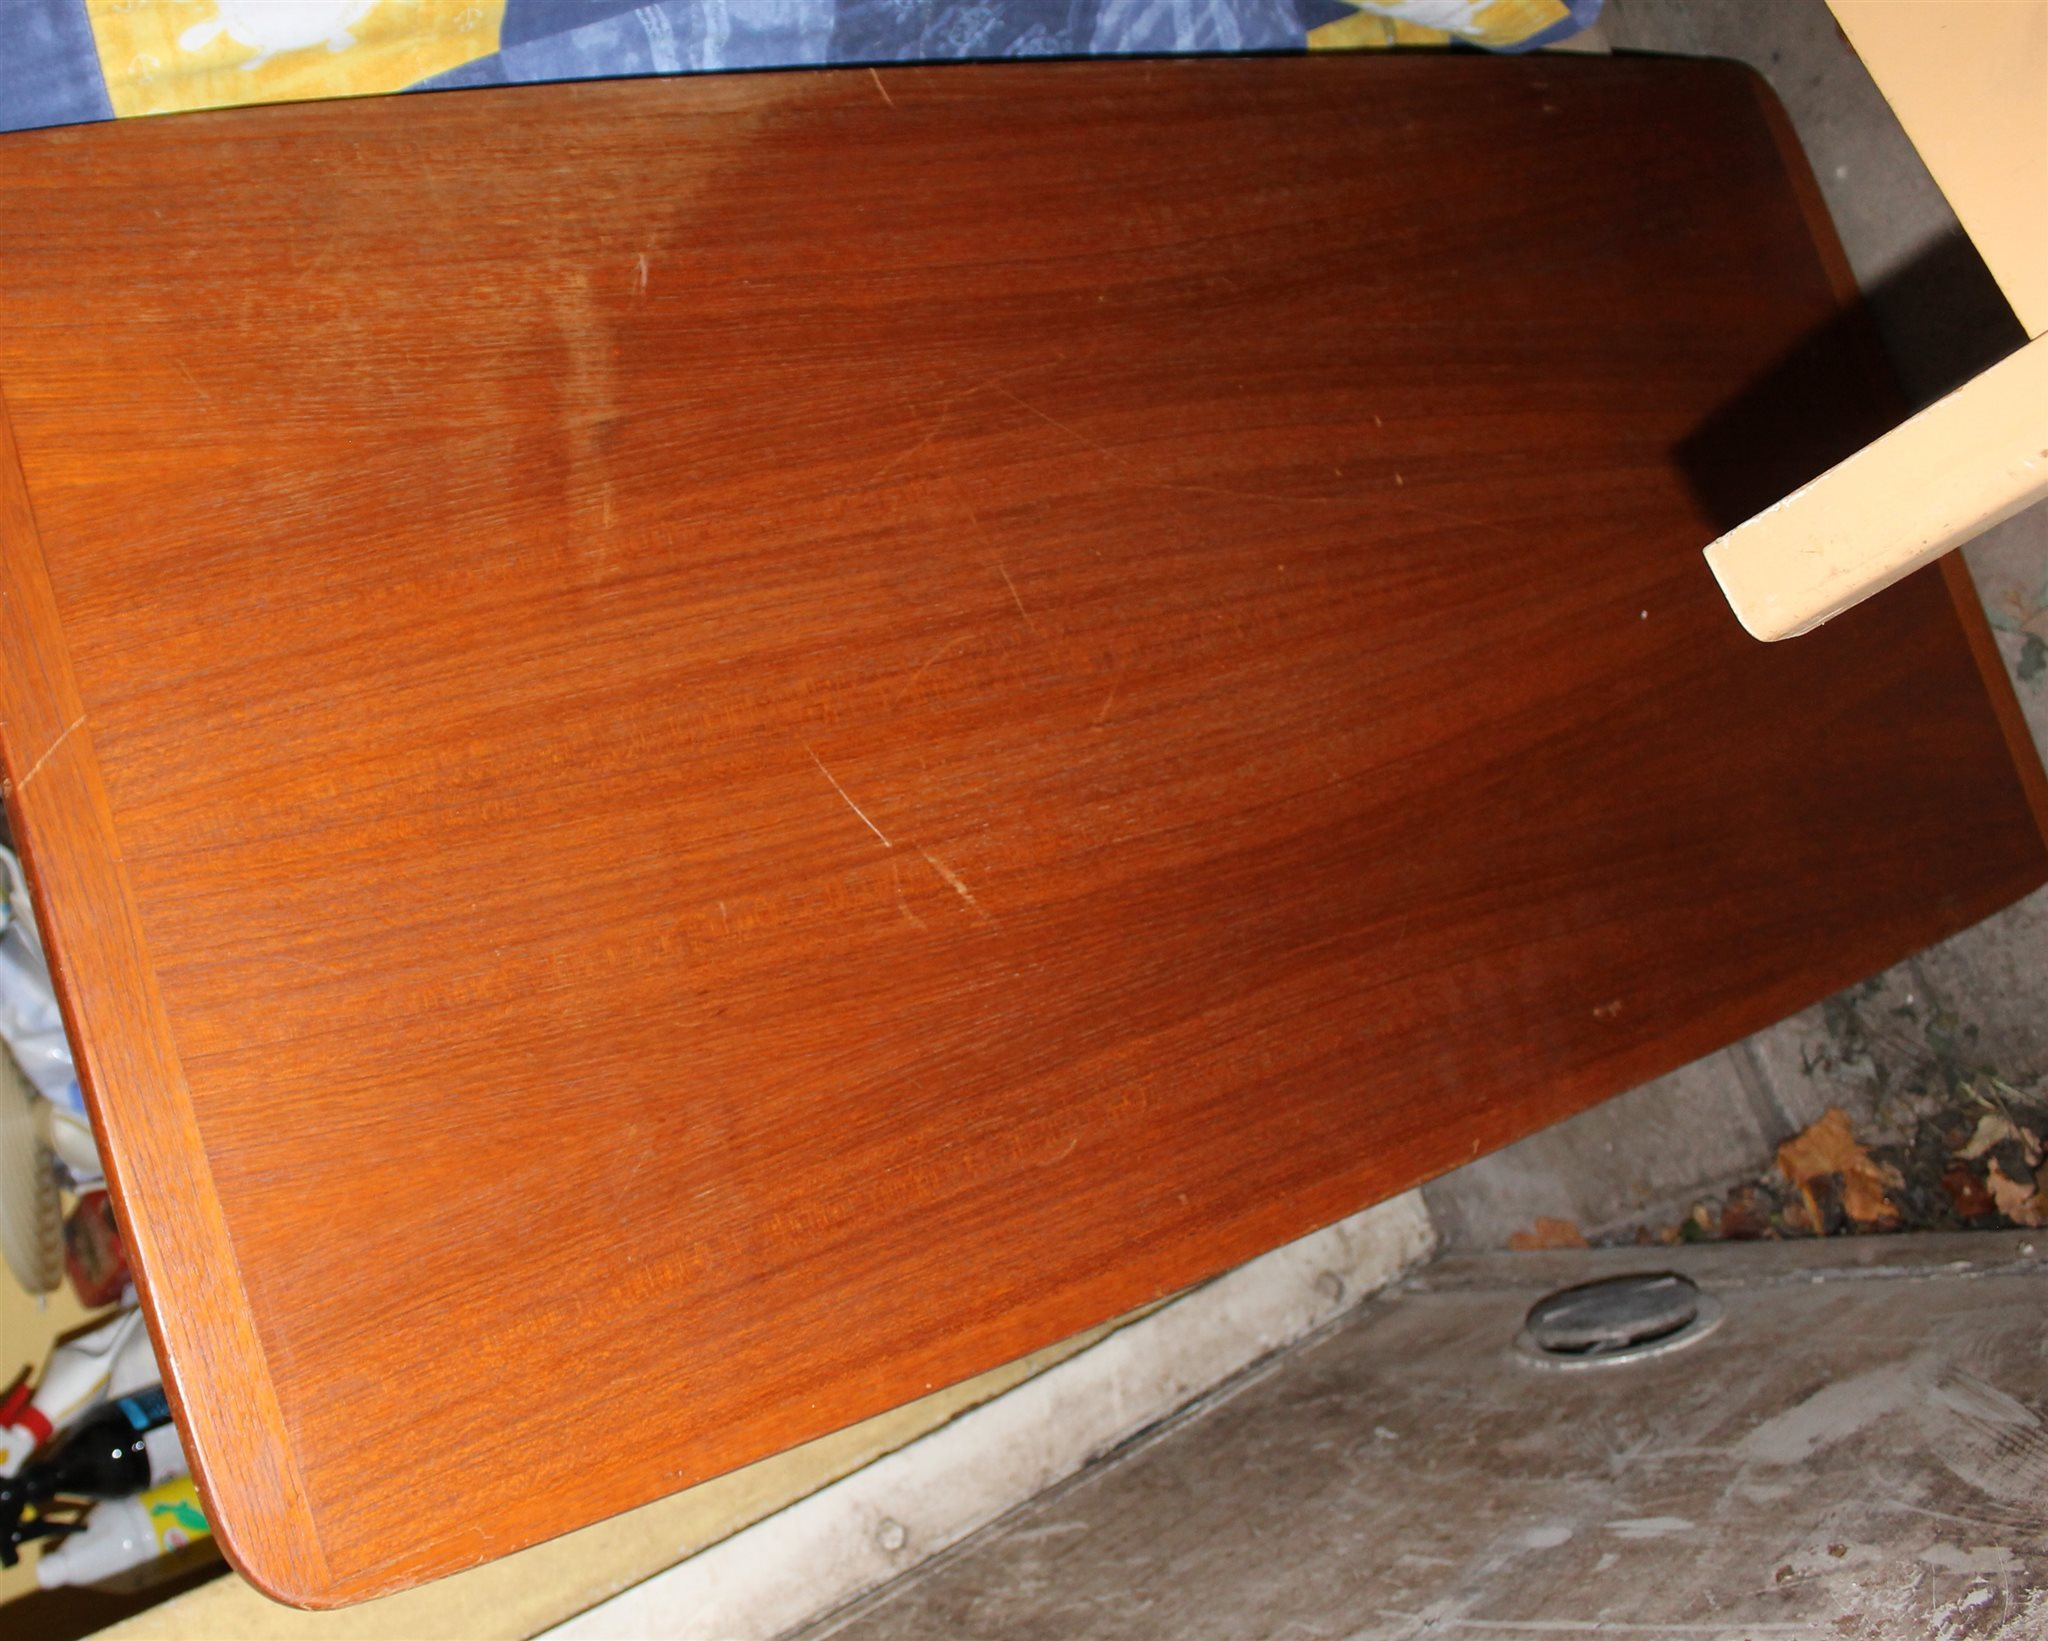 Bord I Teak Soffbord 60 Tal Retro Vintage Inred 426744553 ᐈ Kop Pa Tradera